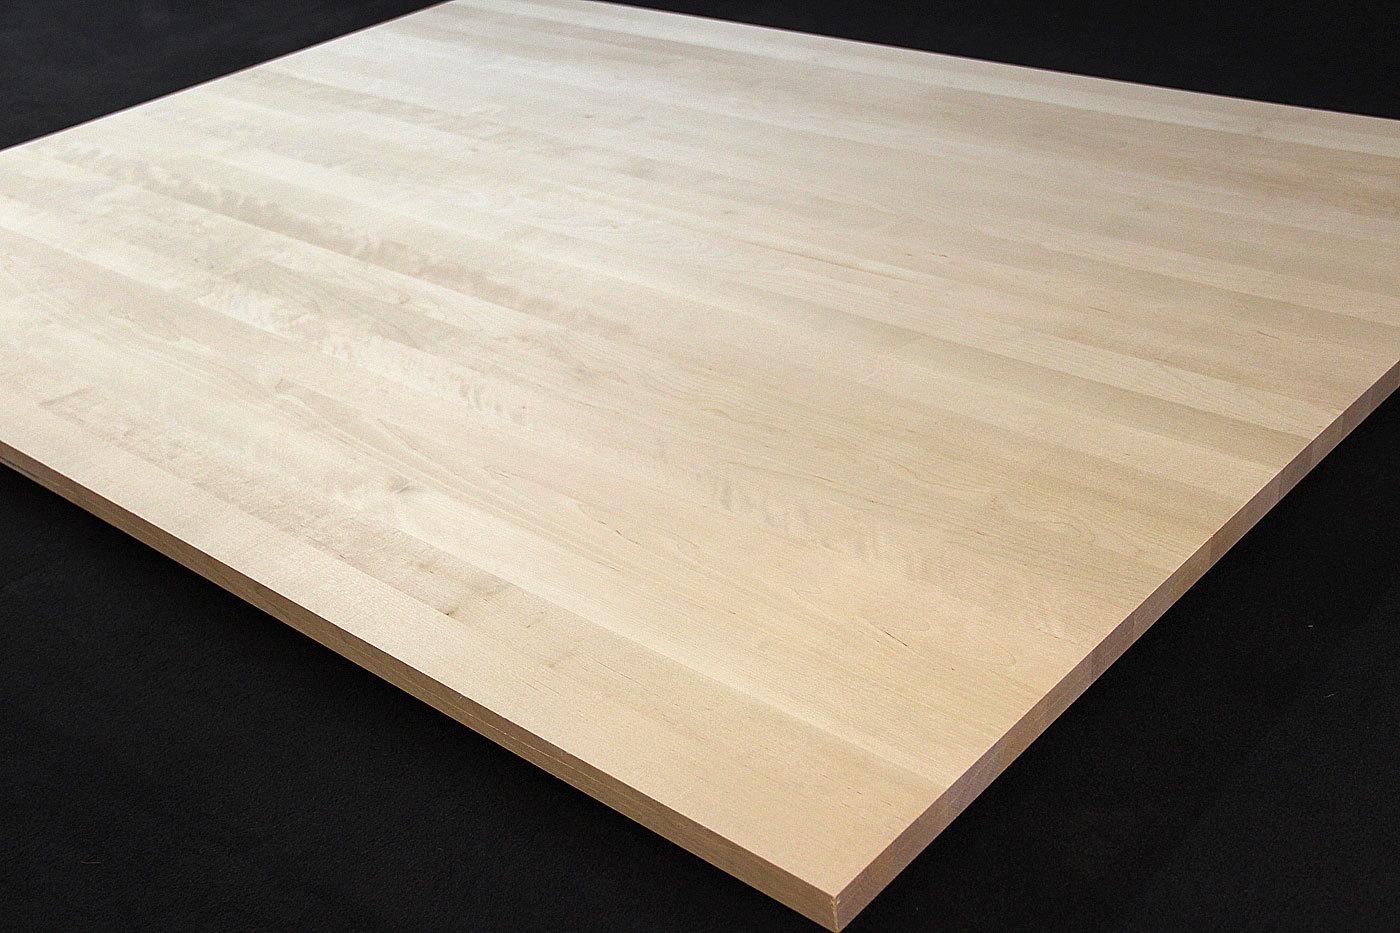 Arbeitsplatte Birke Massiv möbelbauplatte massivholz birke dl 26 x diverse längen x 1210 mm